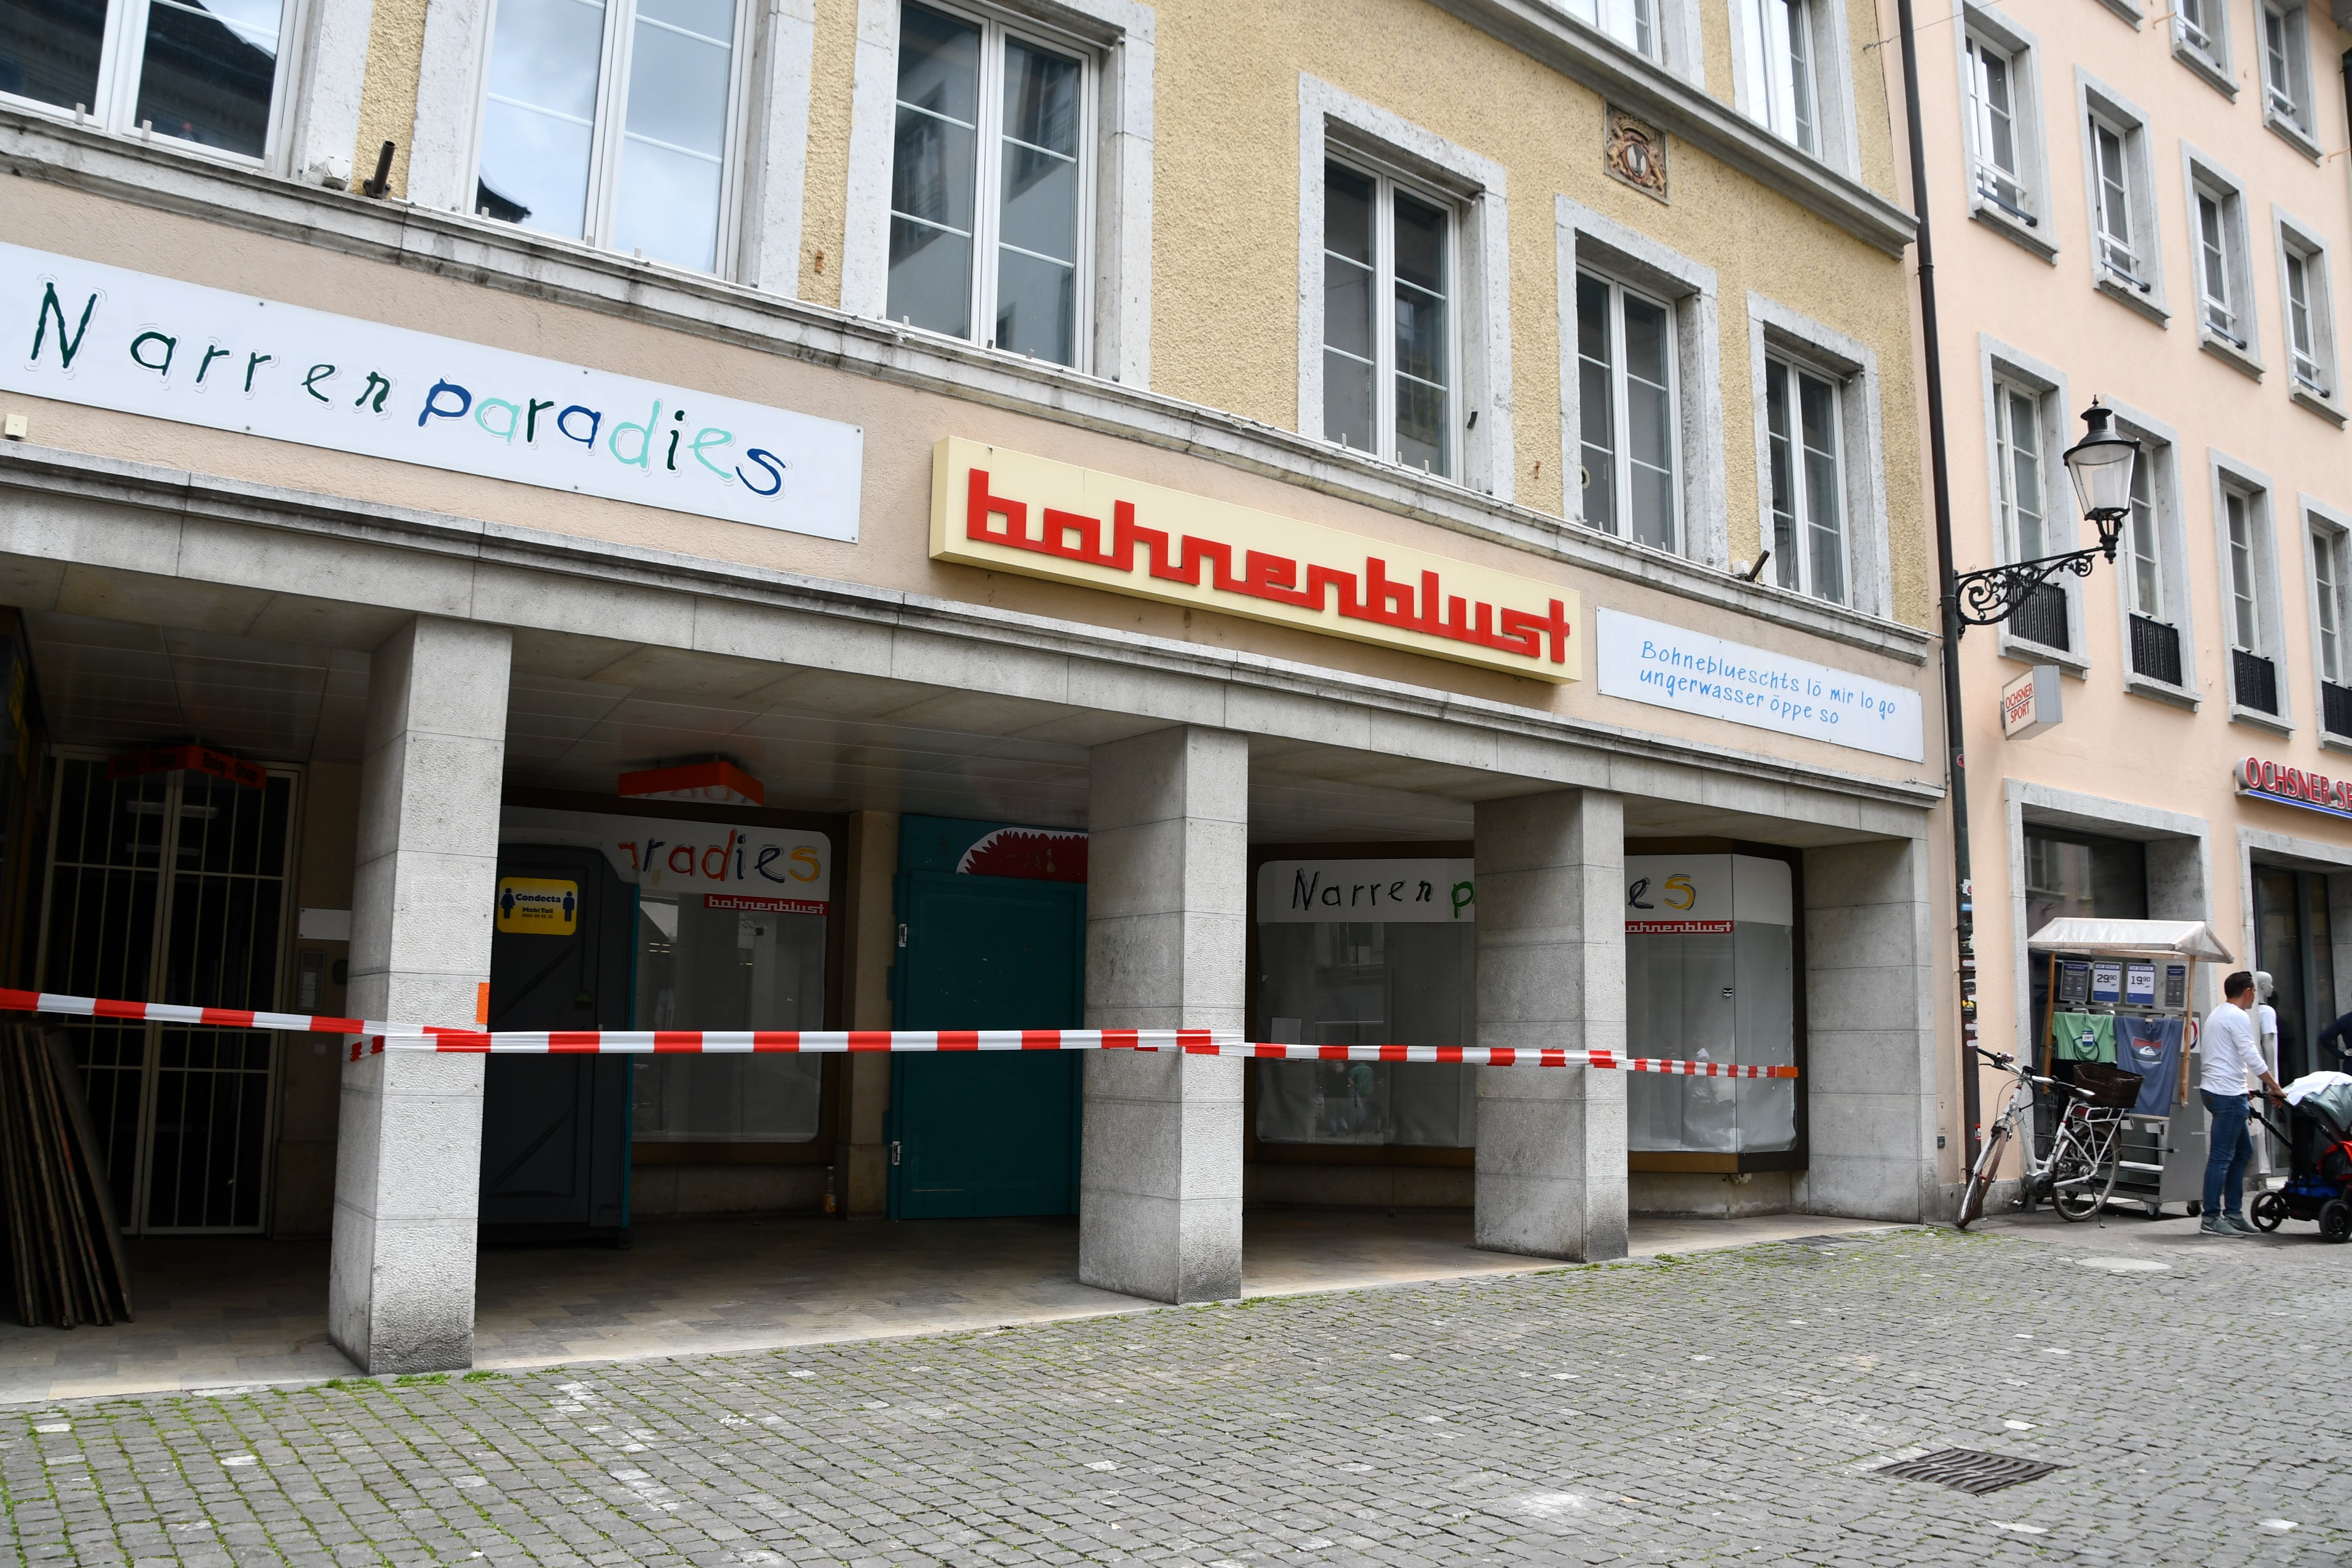 ex-hirsig-bohnenblust-15.06.2019